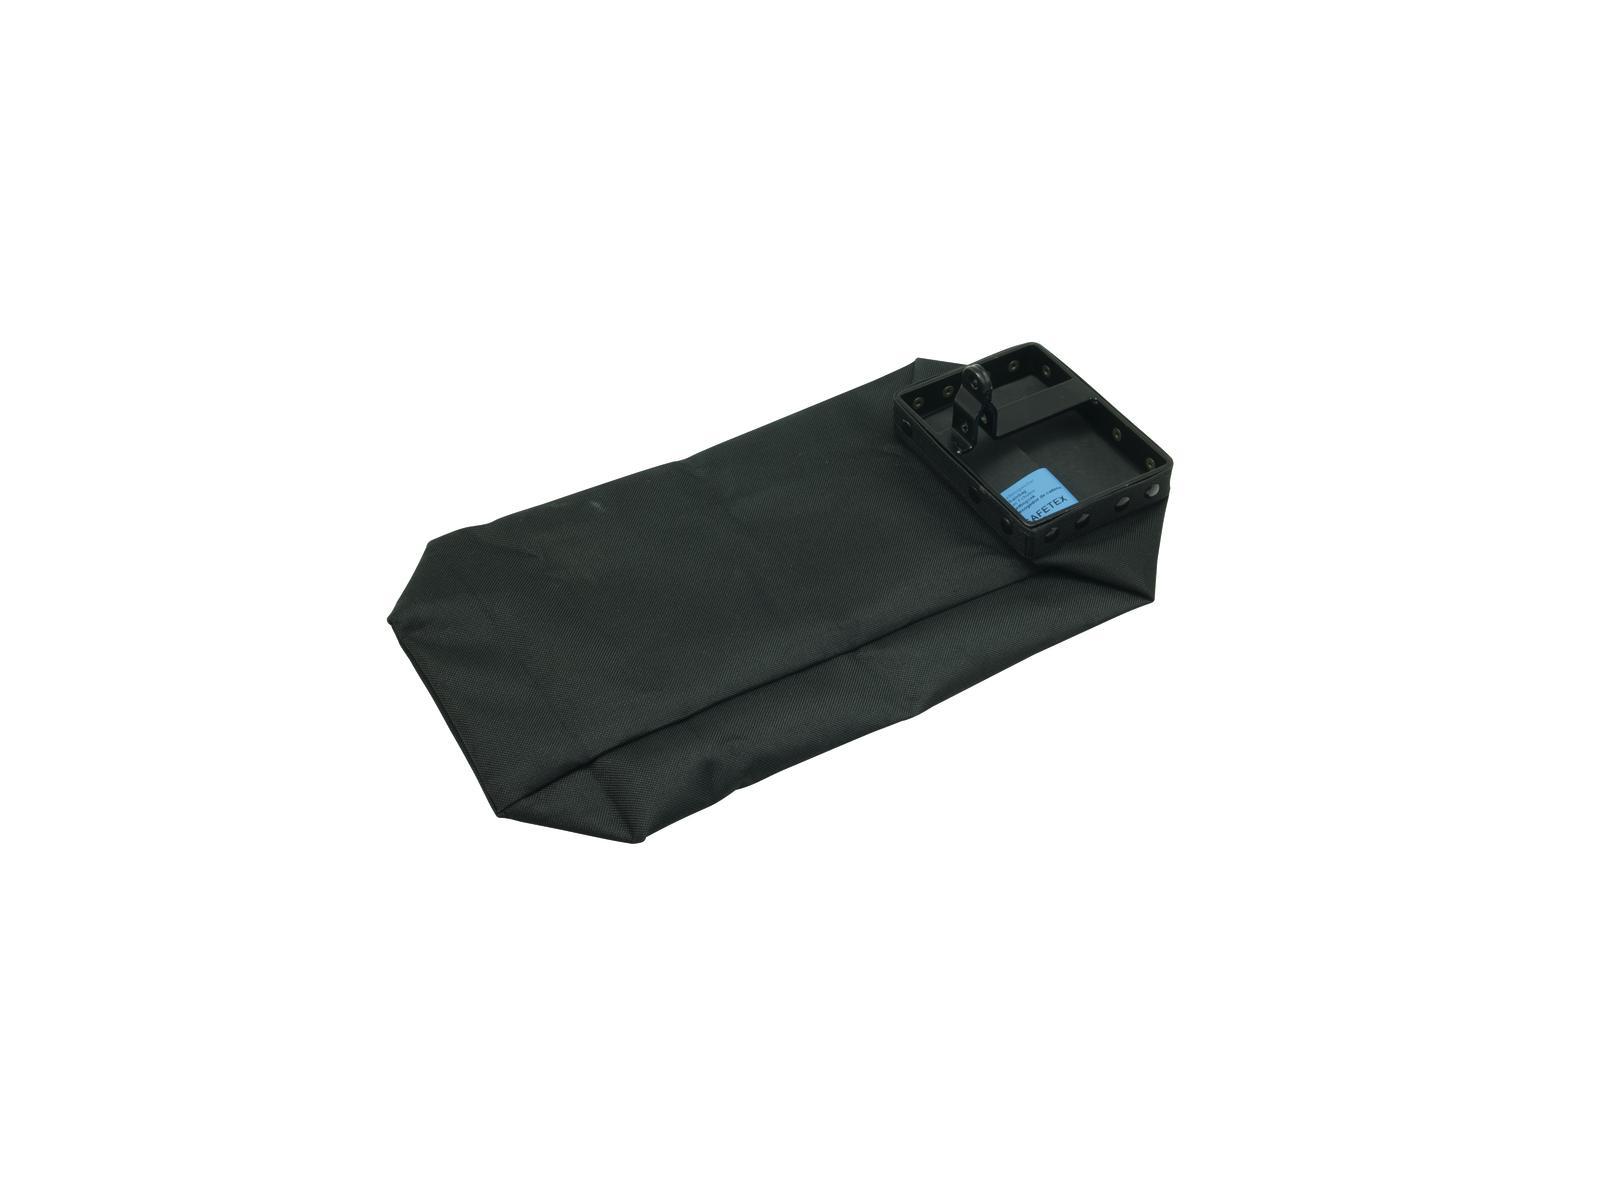 SAFETEX Kettensack 9m Lastkette/18m Handkette